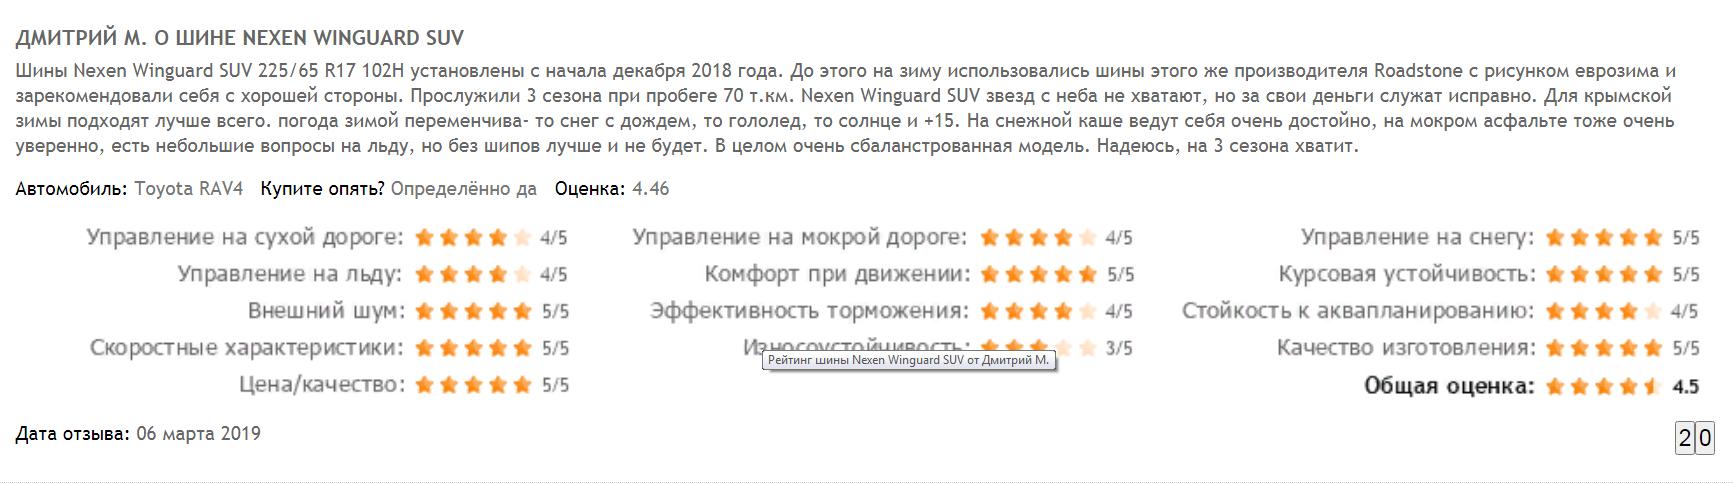 Отзывы о шинах Nexen Winguard SUV